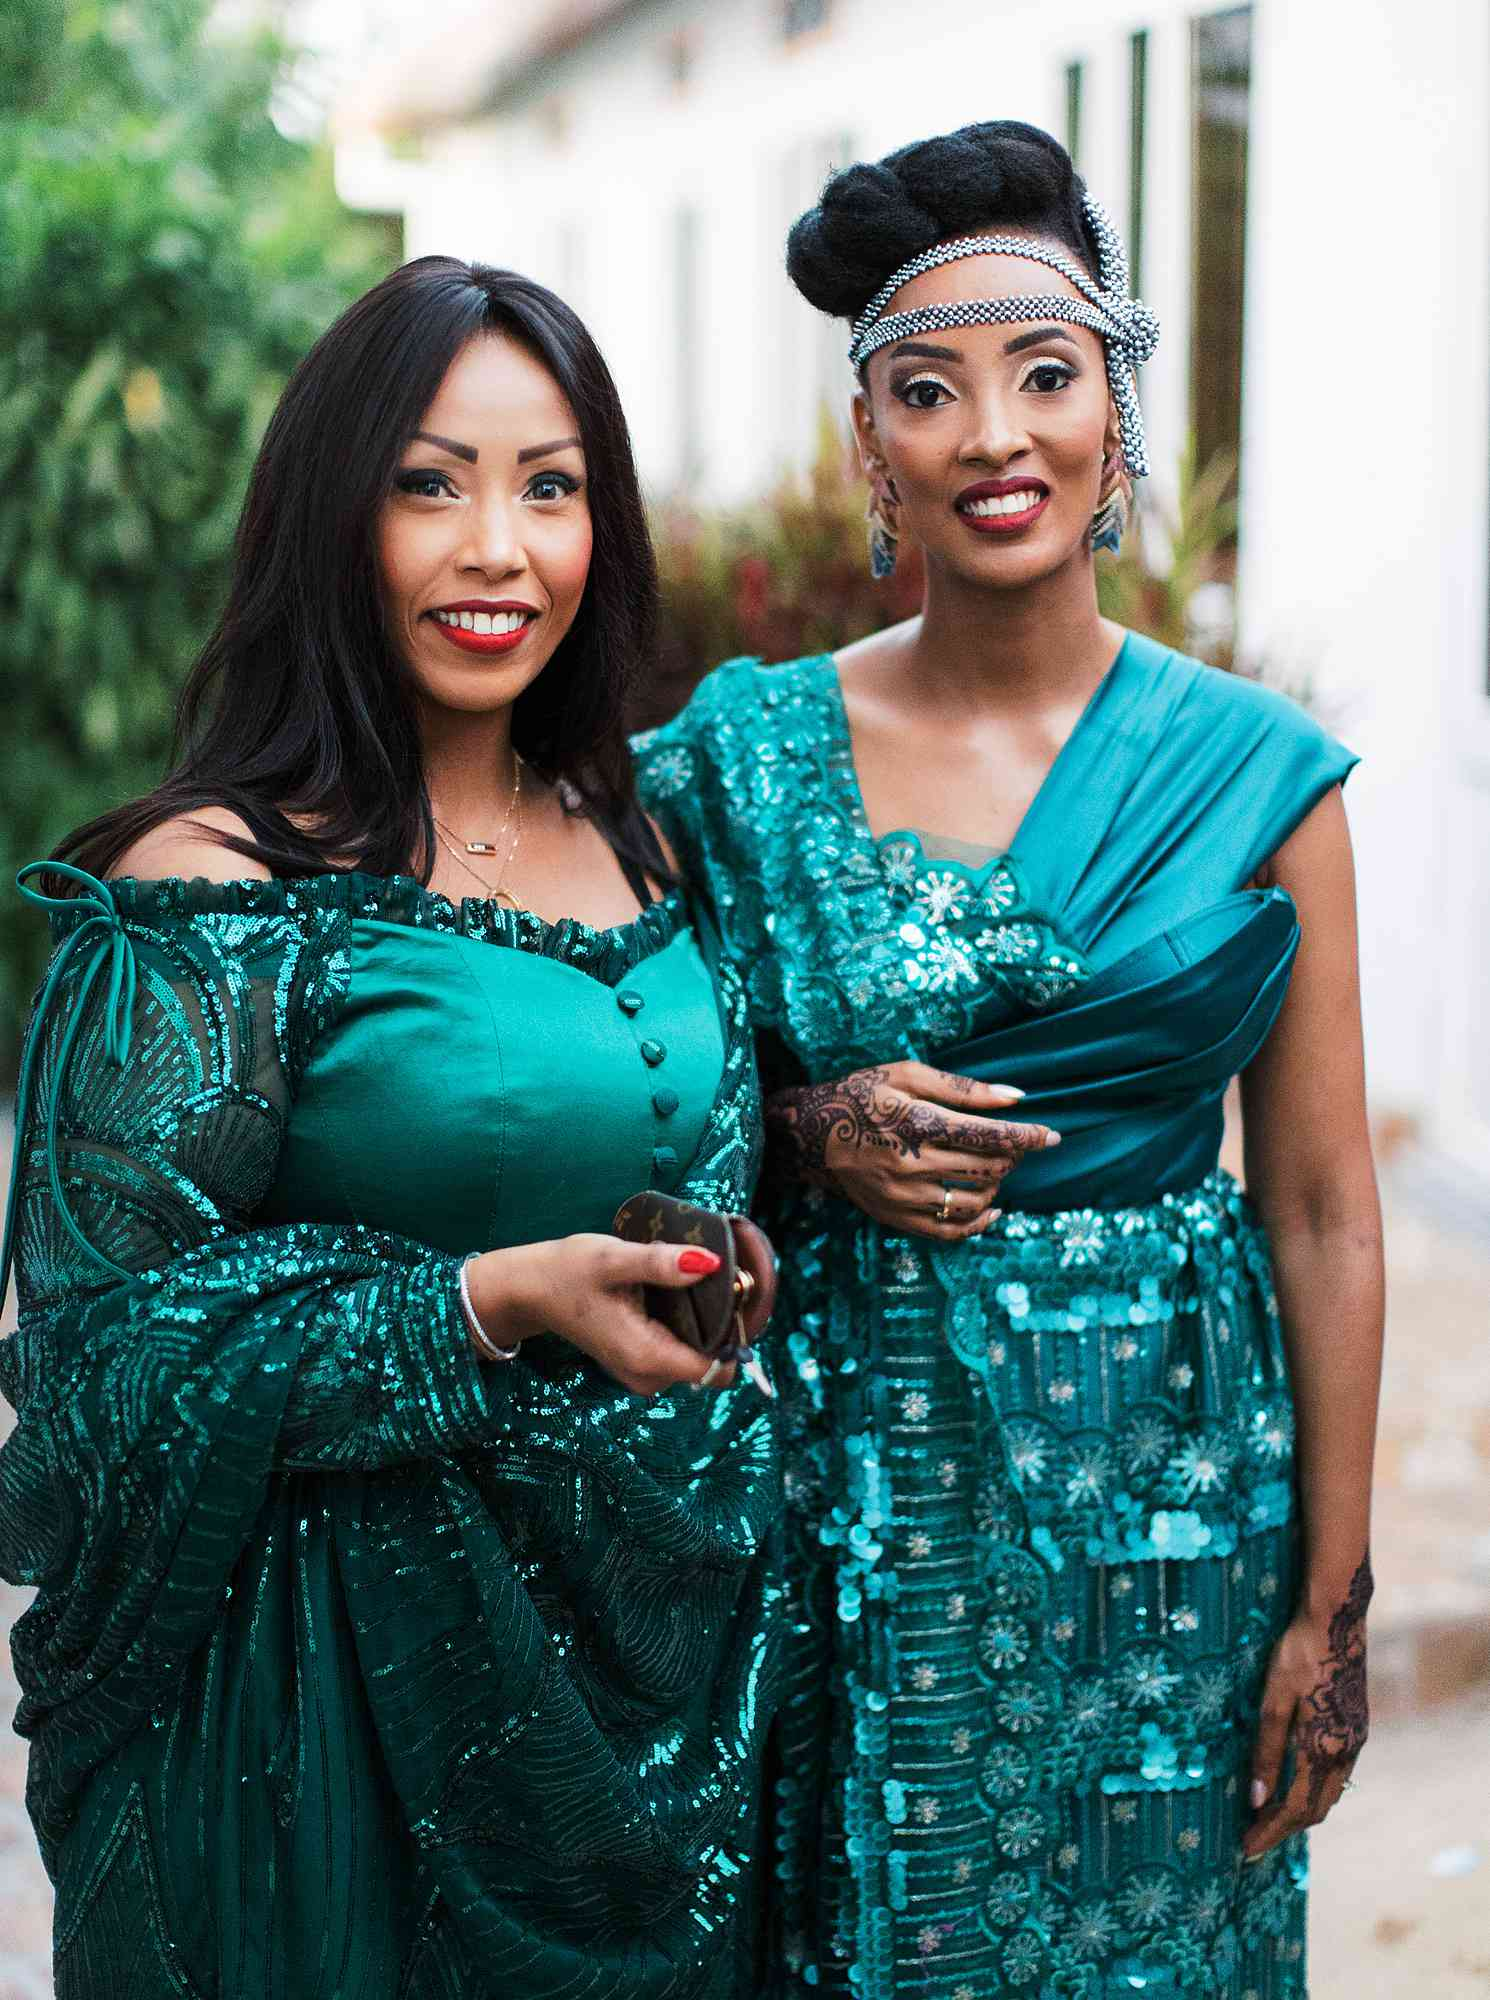 Bride and bridesmaid in emerald green